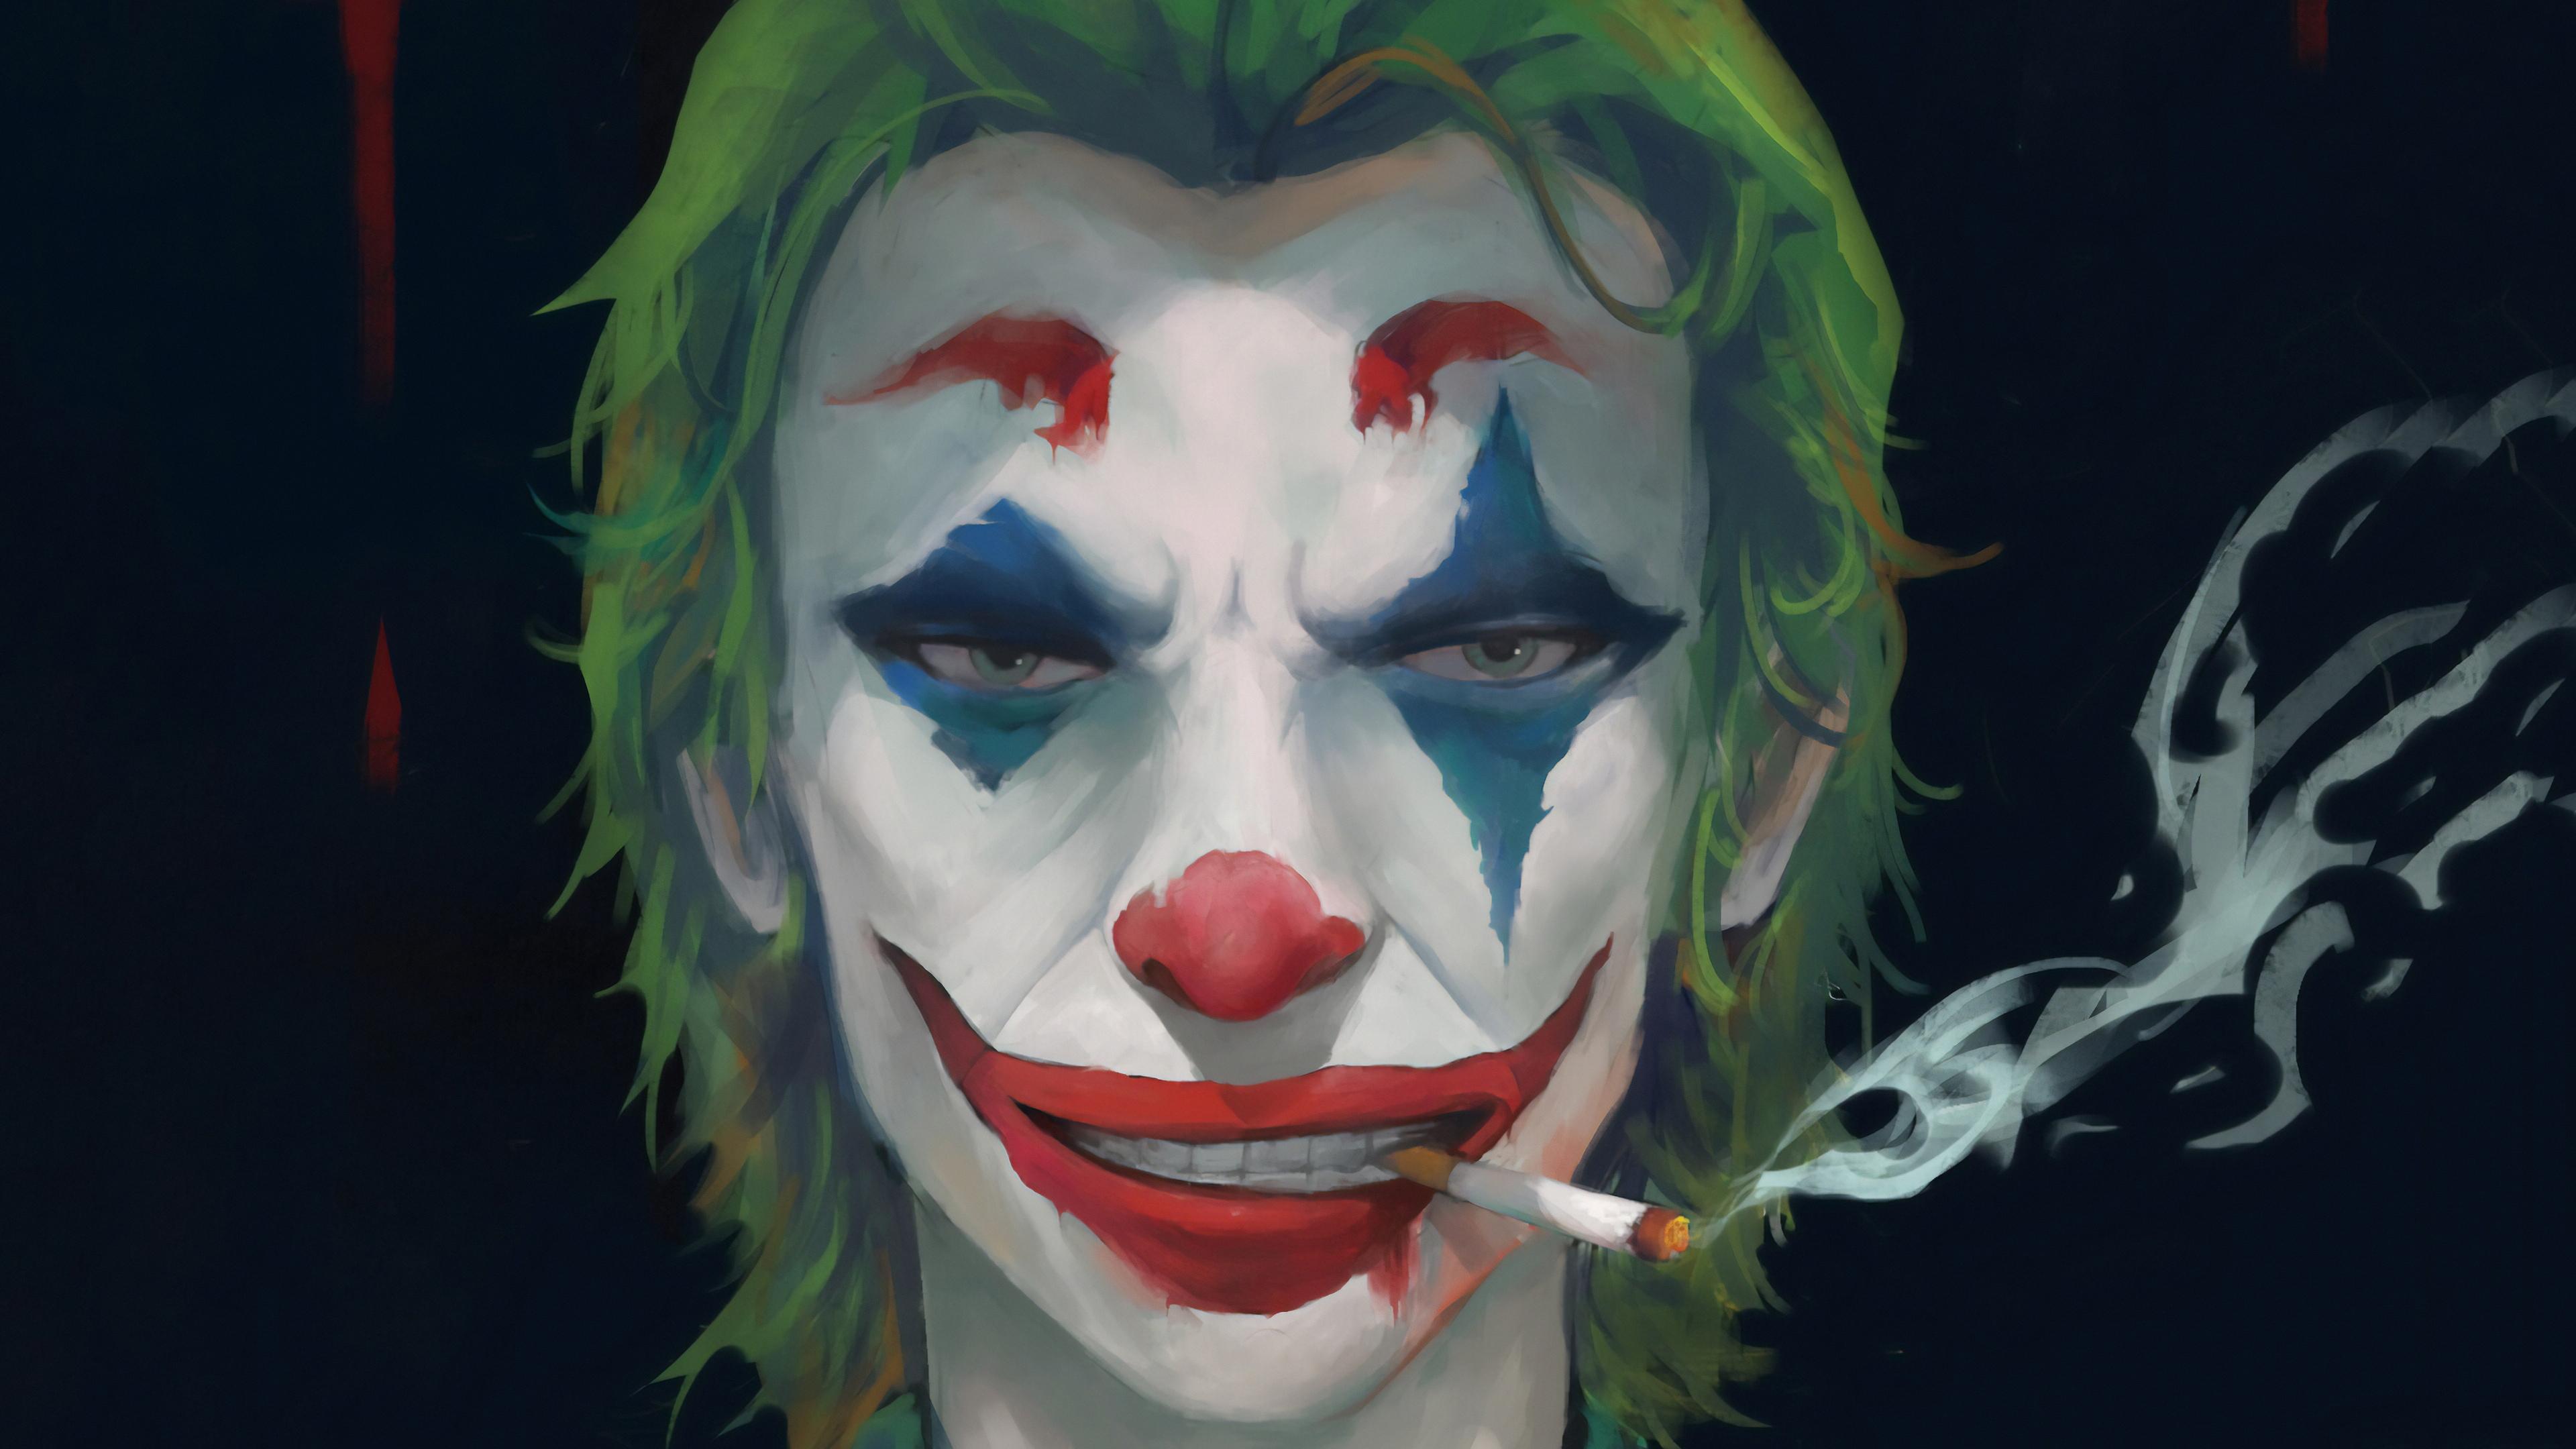 joker cigrate 1570394330 - Joker Cigrate - supervillain wallpapers, superheroes wallpapers, joker wallpapers, hd-wallpapers, artwork wallpapers